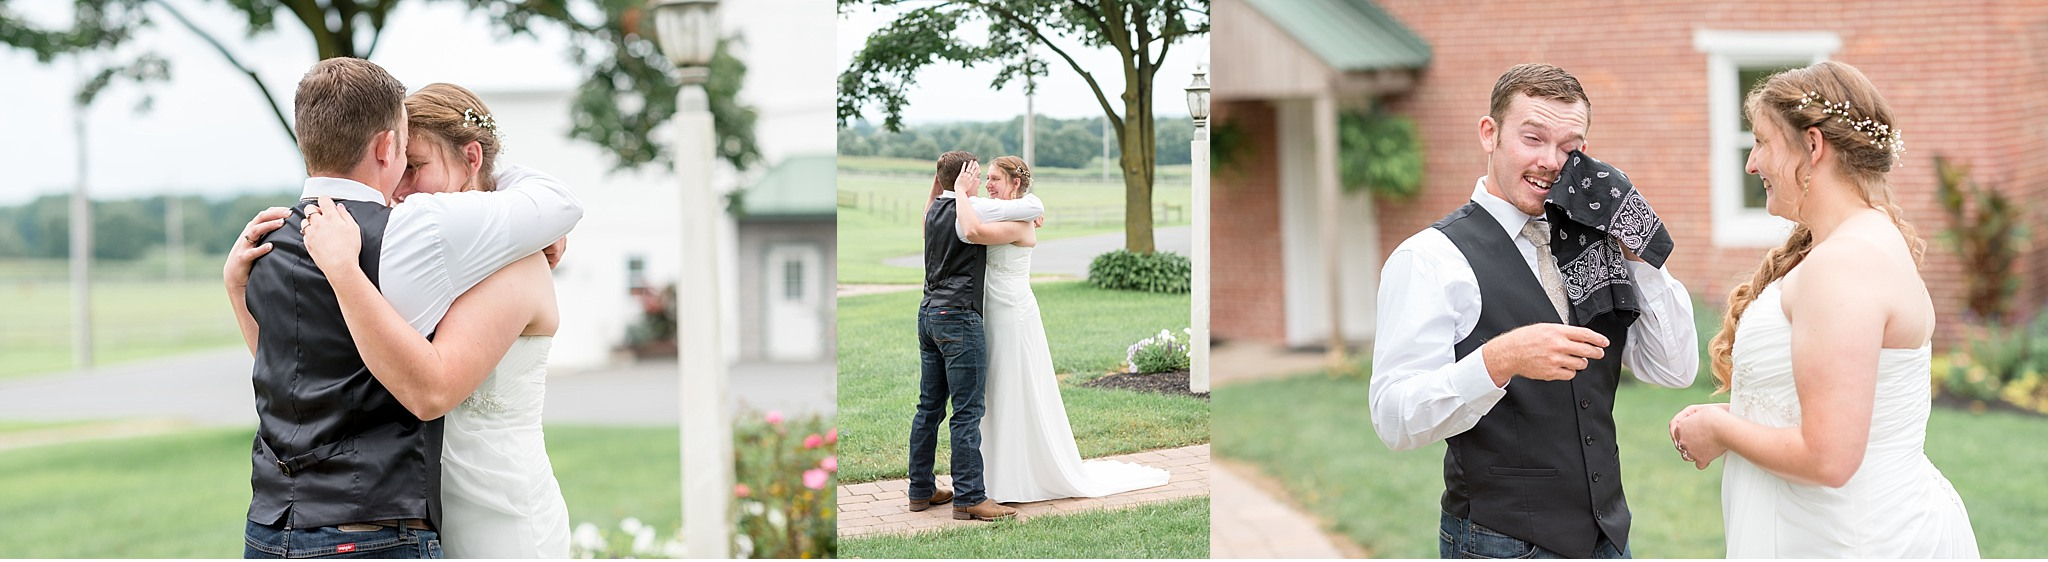 Romantic Summer wedding Springside Barn East Earl PA Lancaster County wedding Photography_2030.jpg